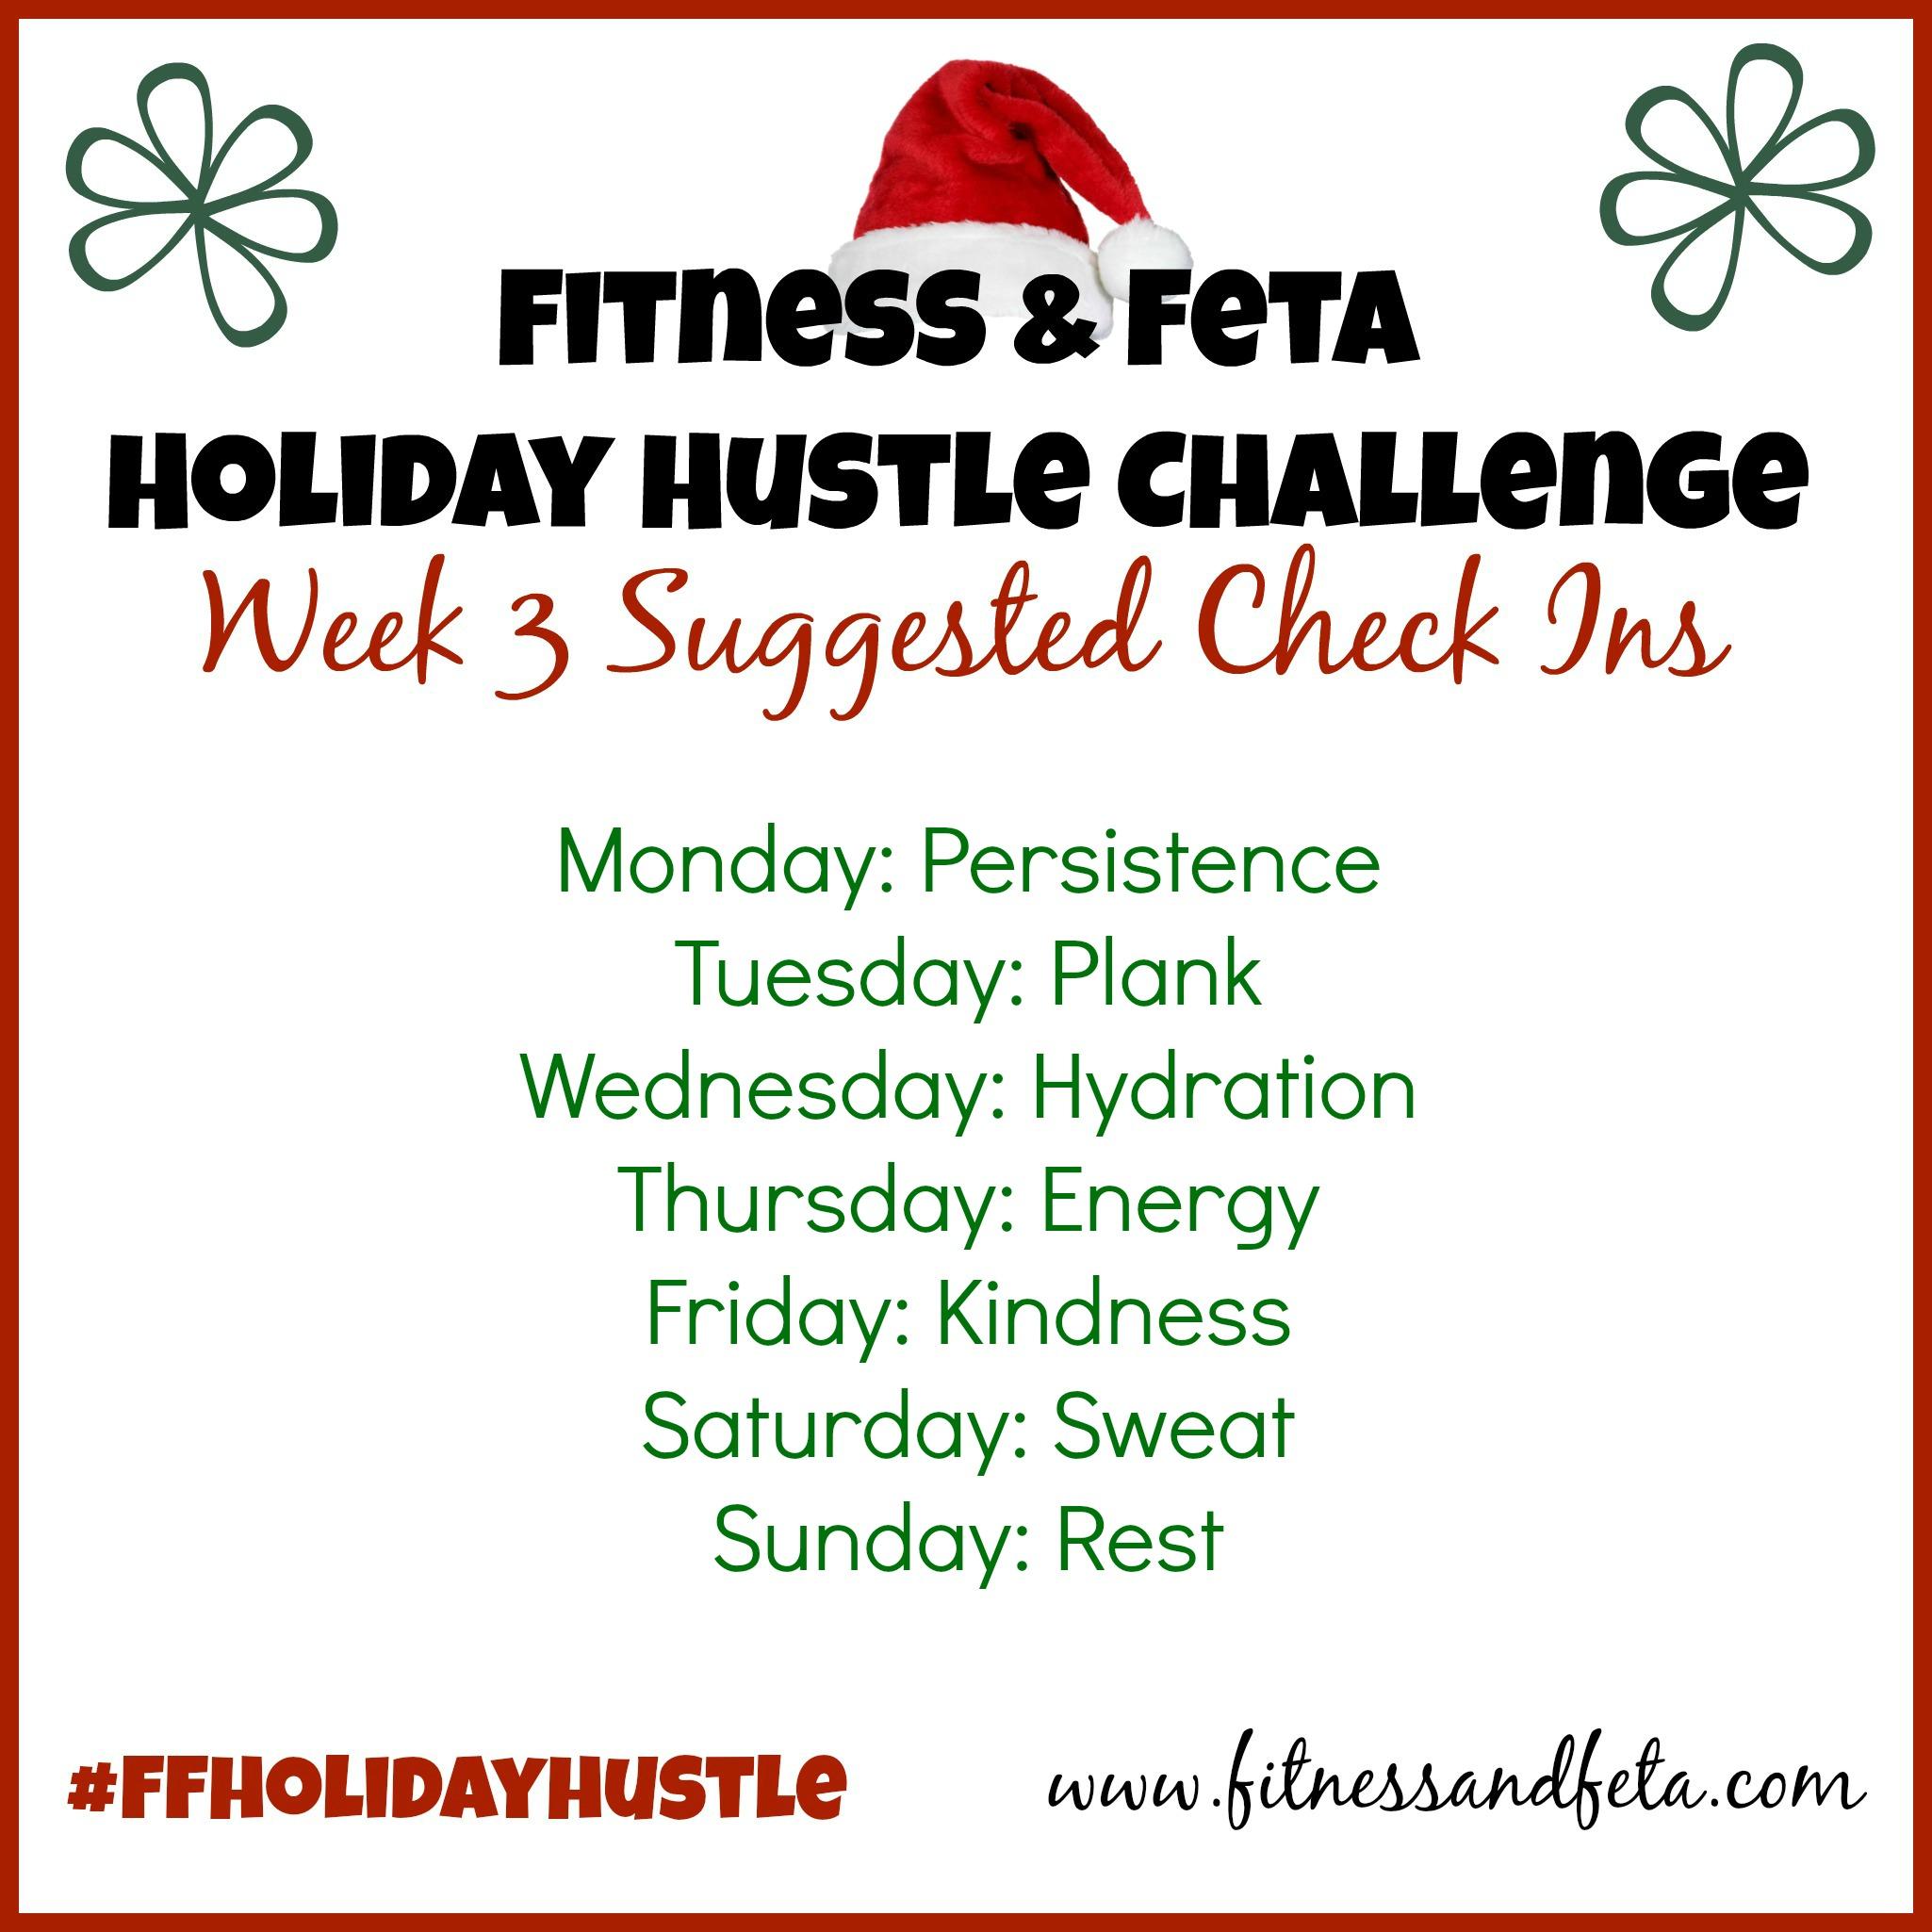 Week 3 Check Ins